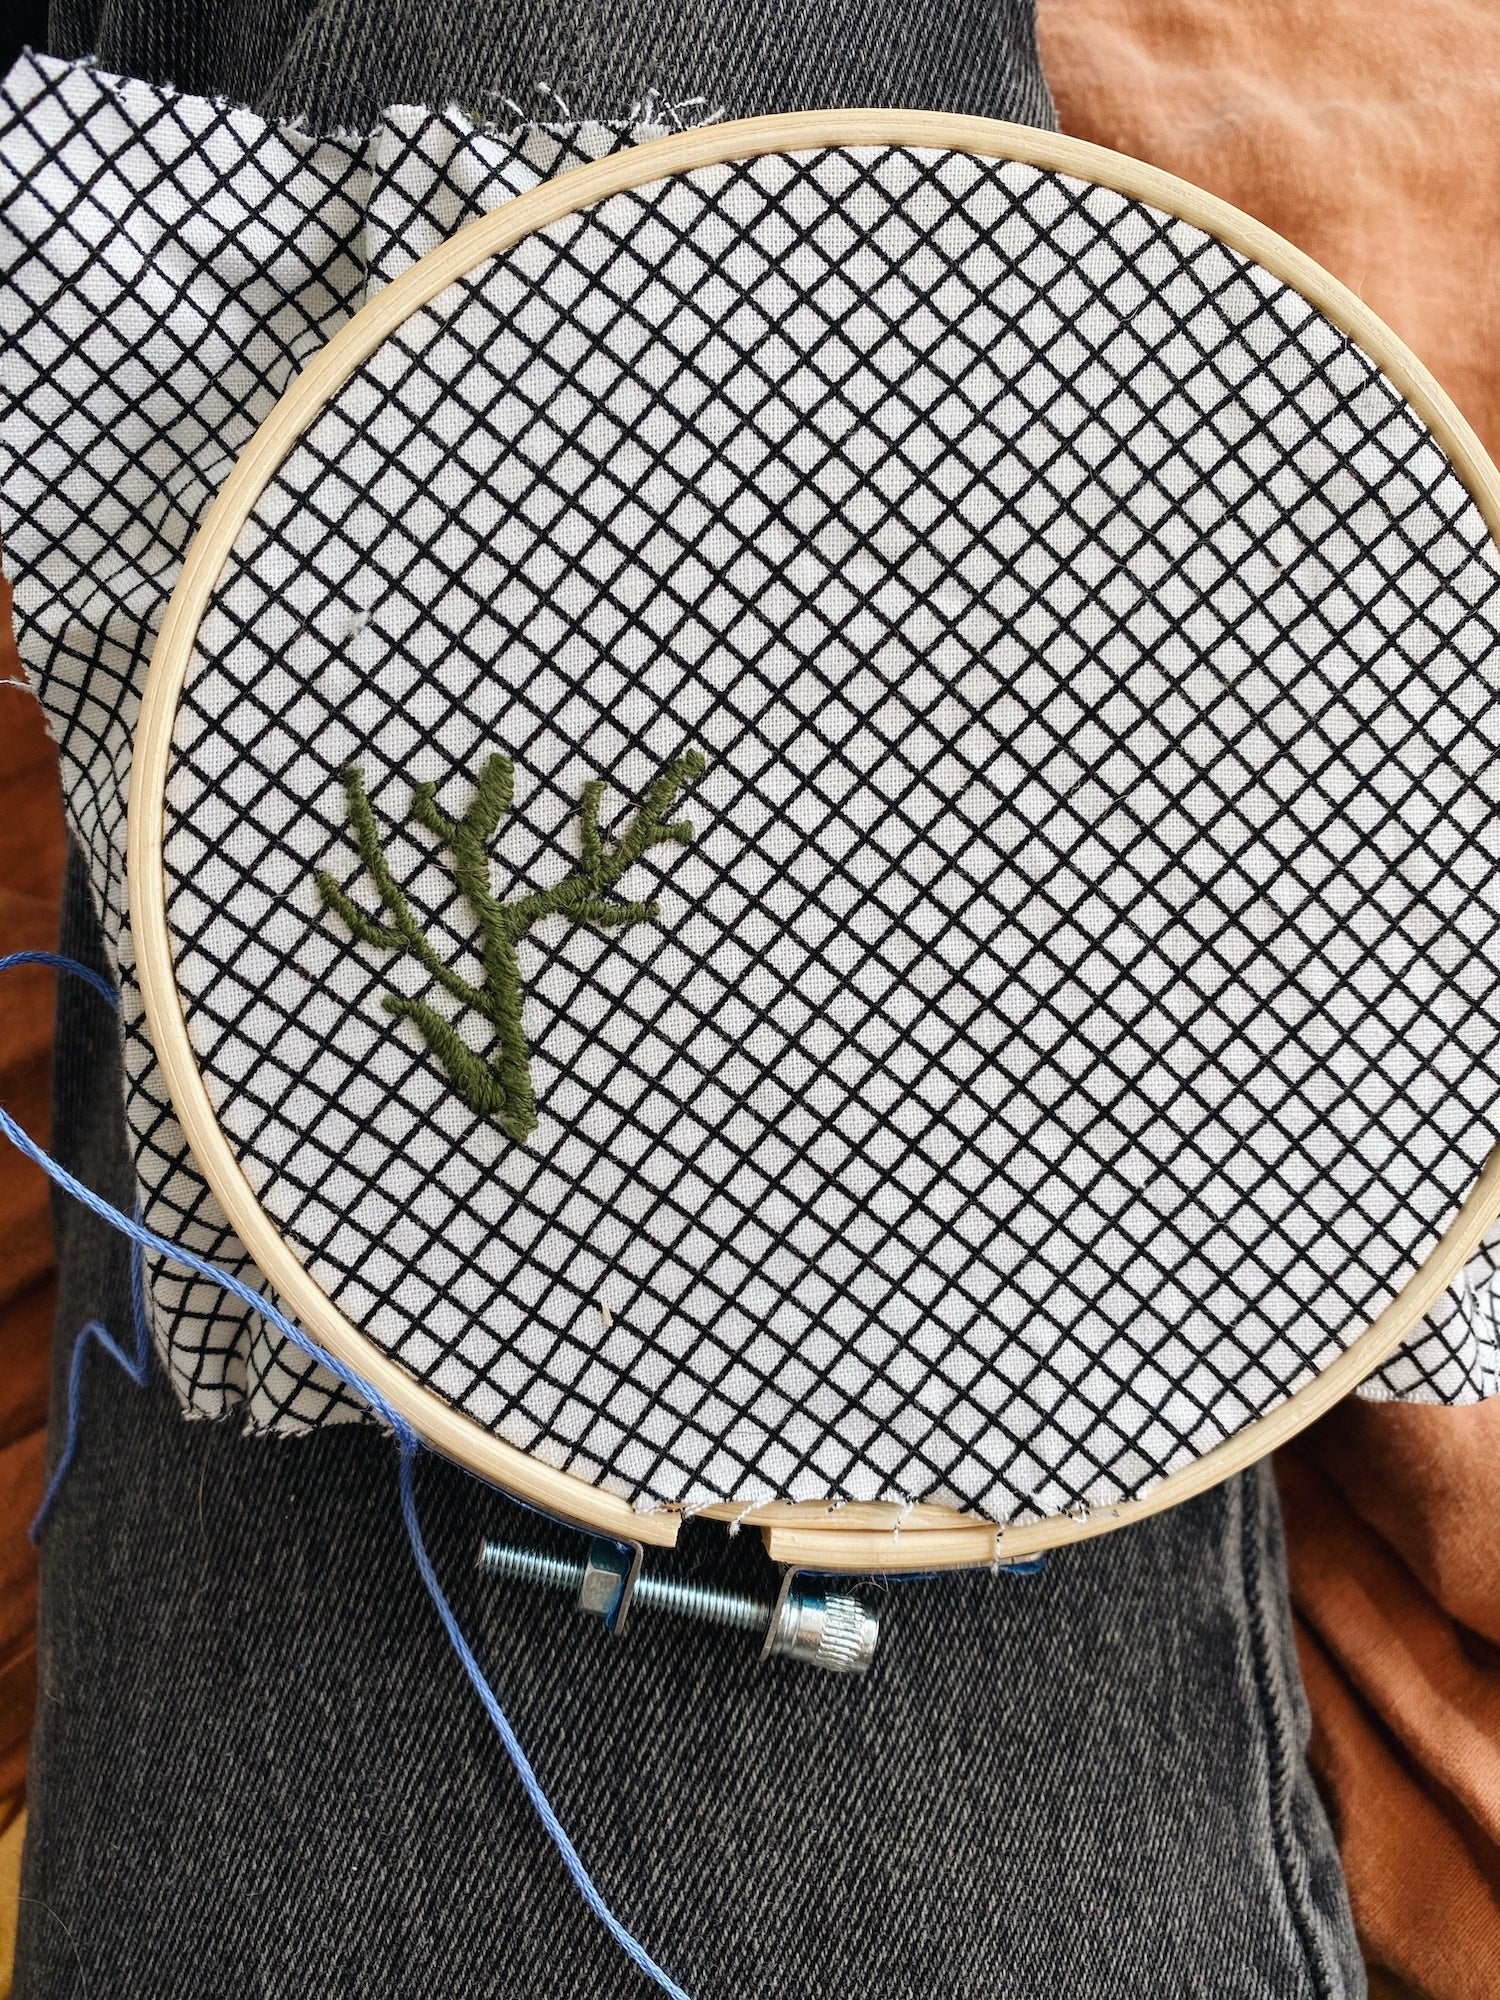 fabric in a hoop